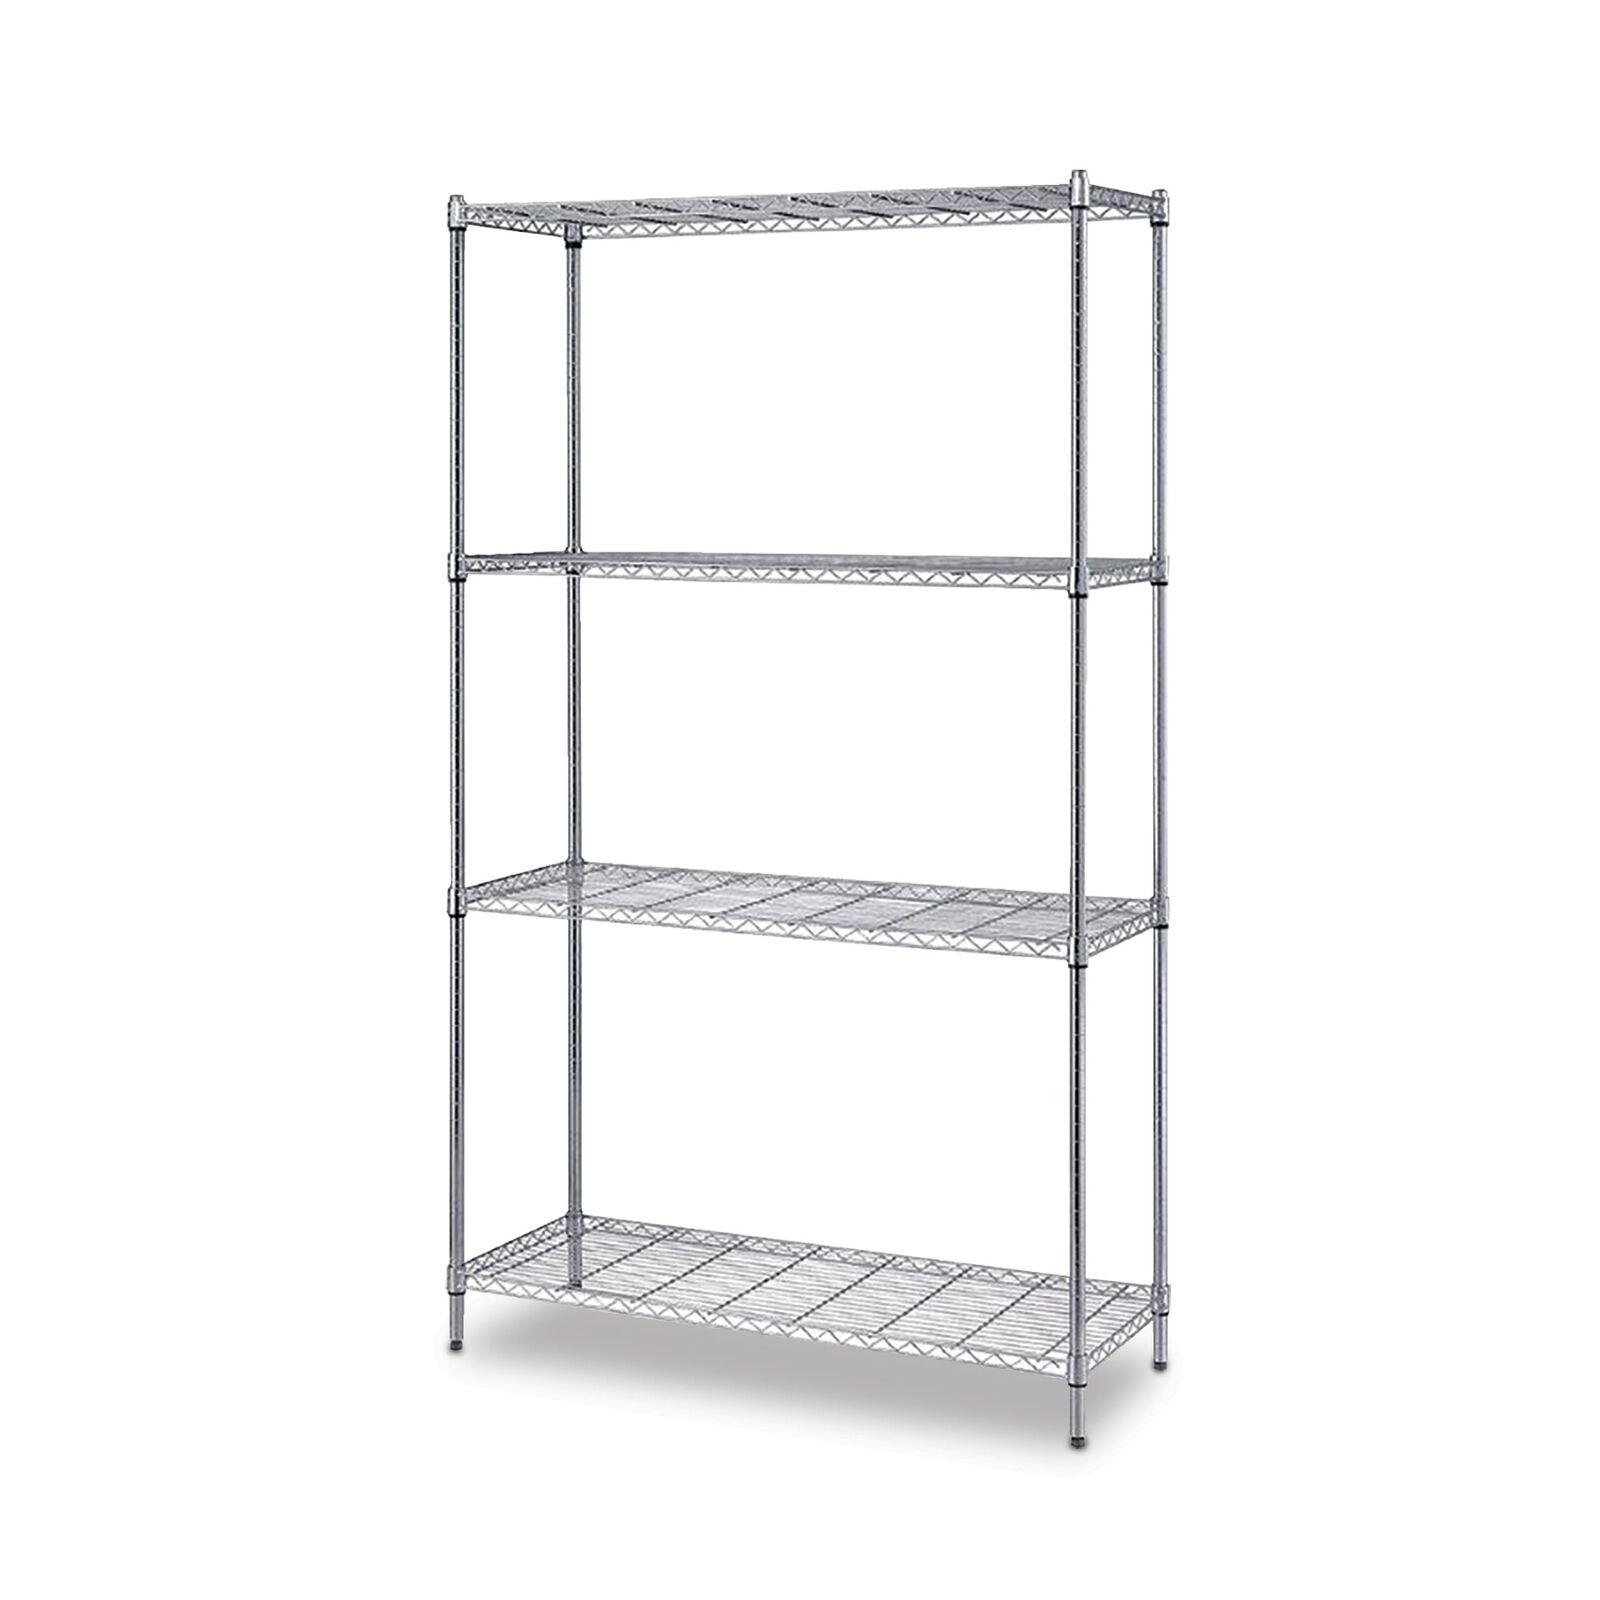 One Box Wire Shelving 4 Shelf Unit 24 D X 72 H 30 W 1 Ea